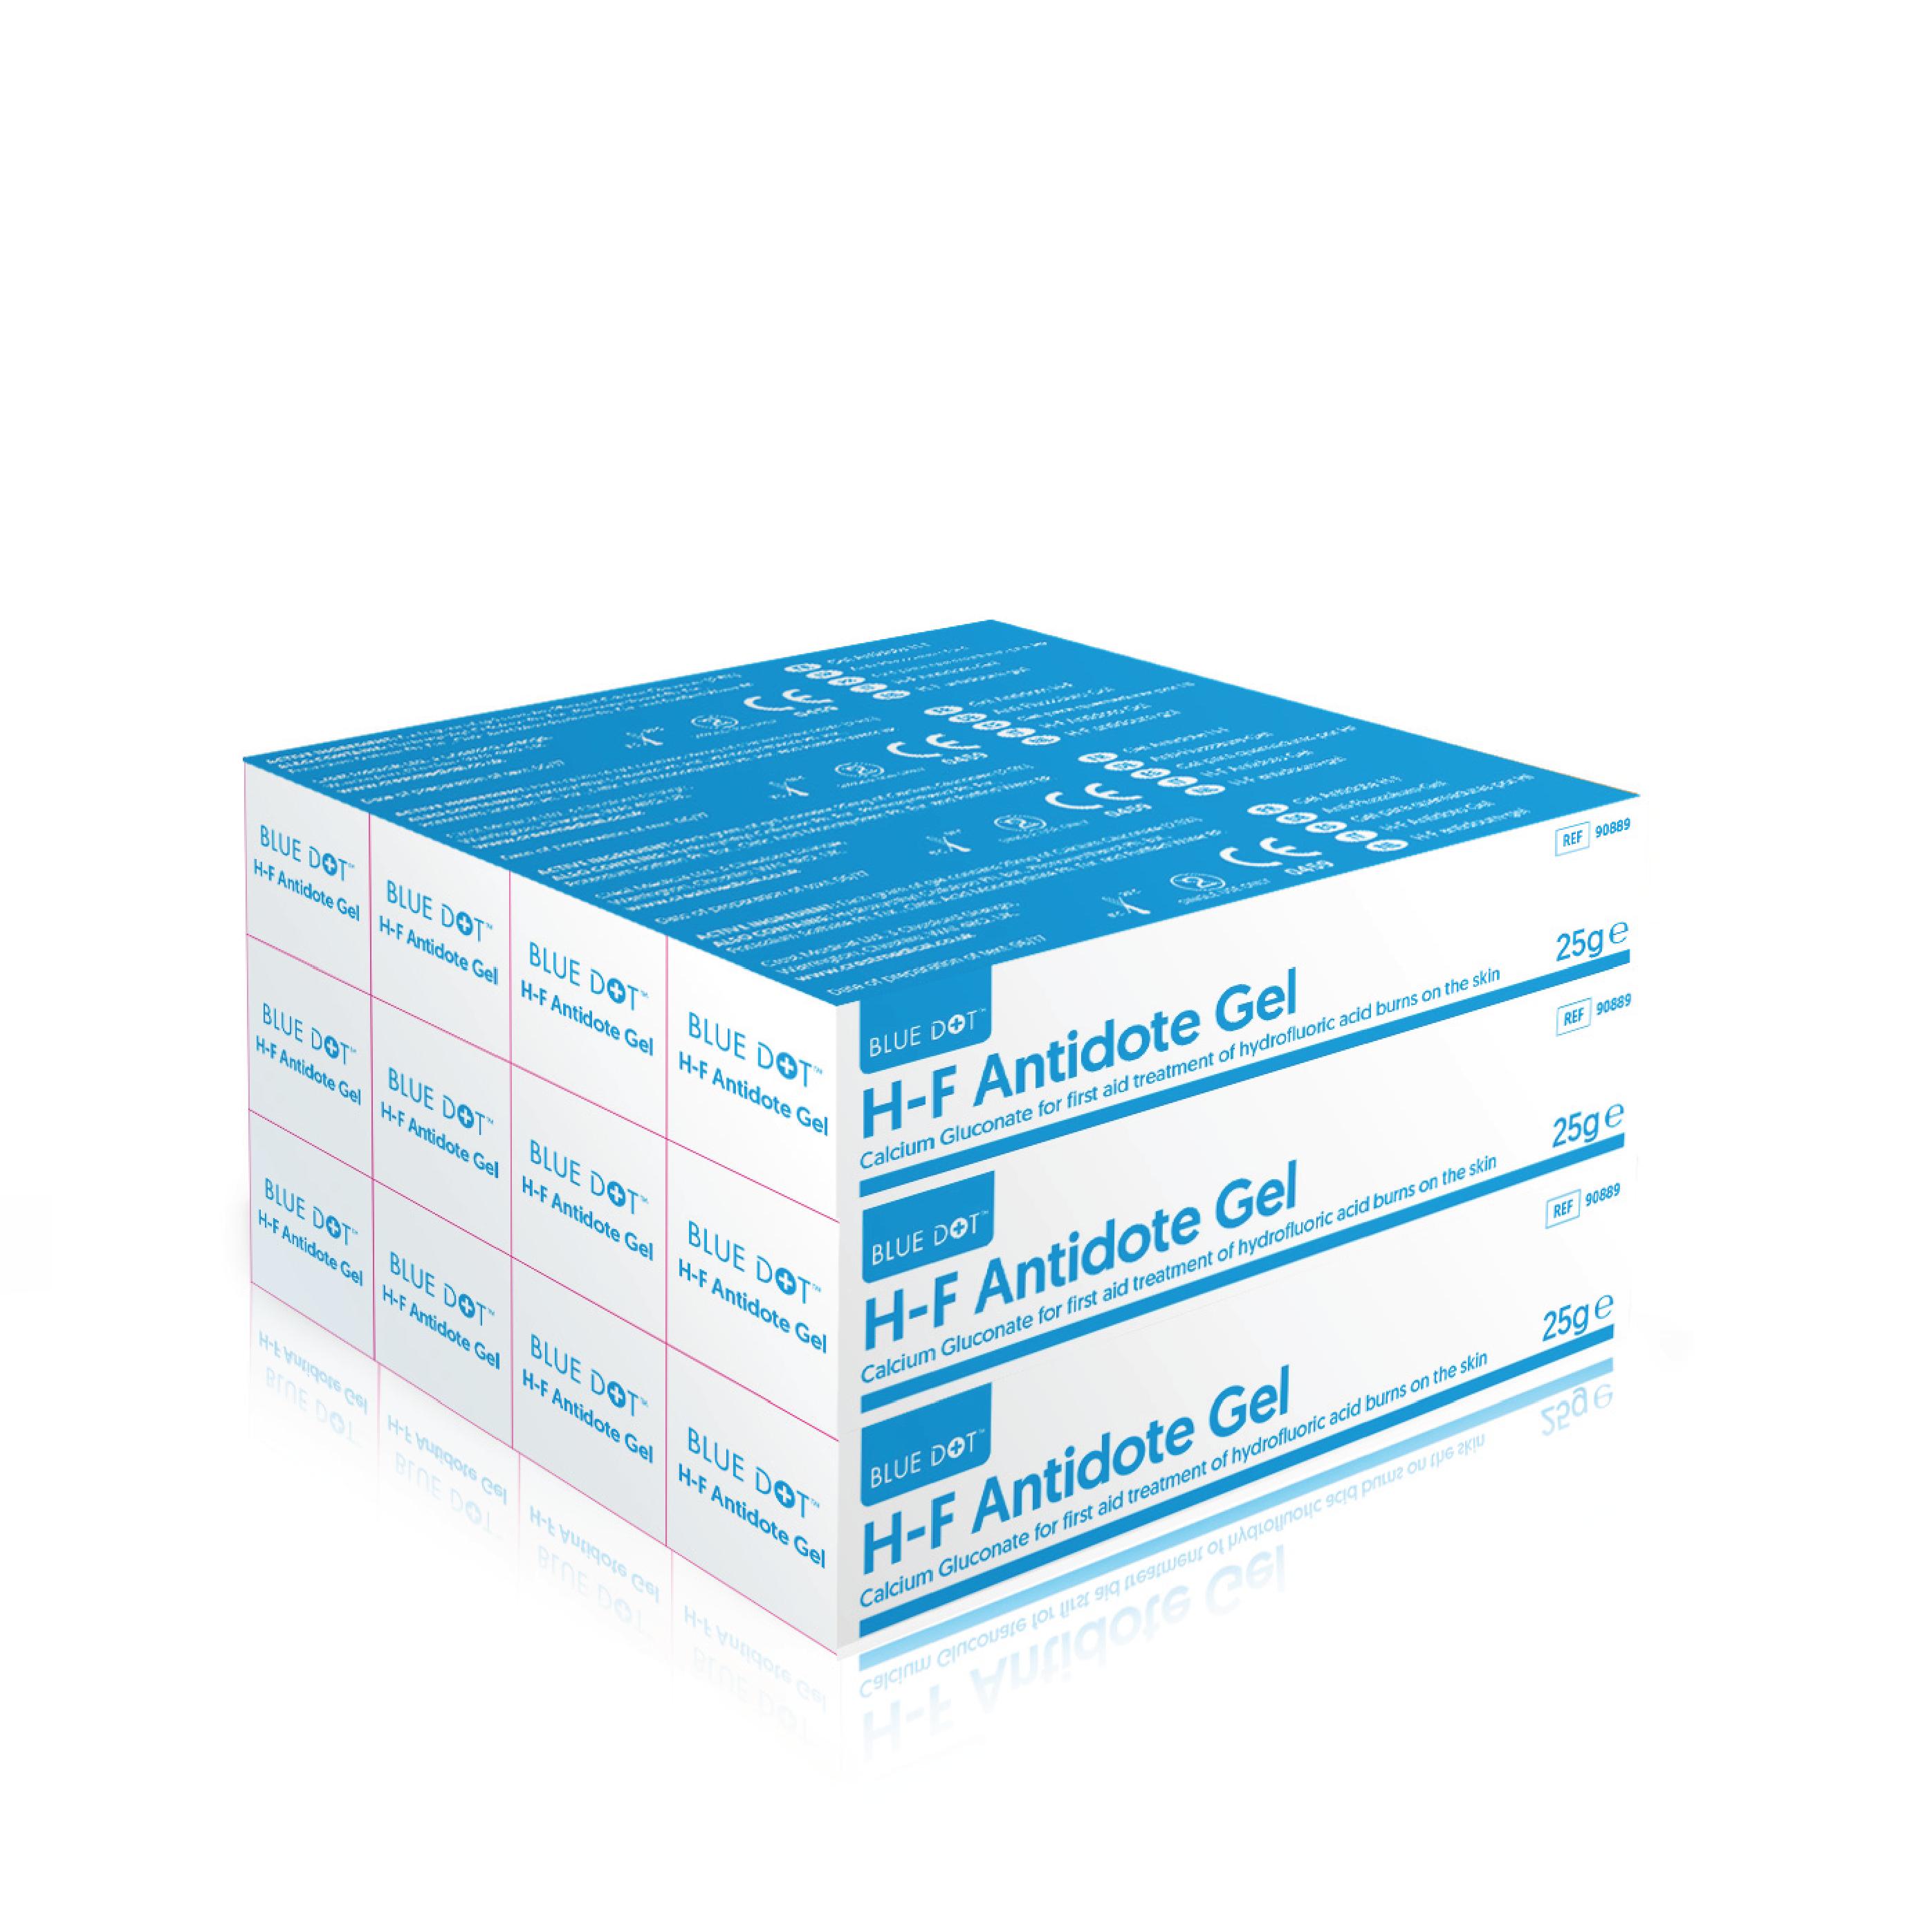 25g Blue Dot H-F Antidote Gel (Pack of 12)